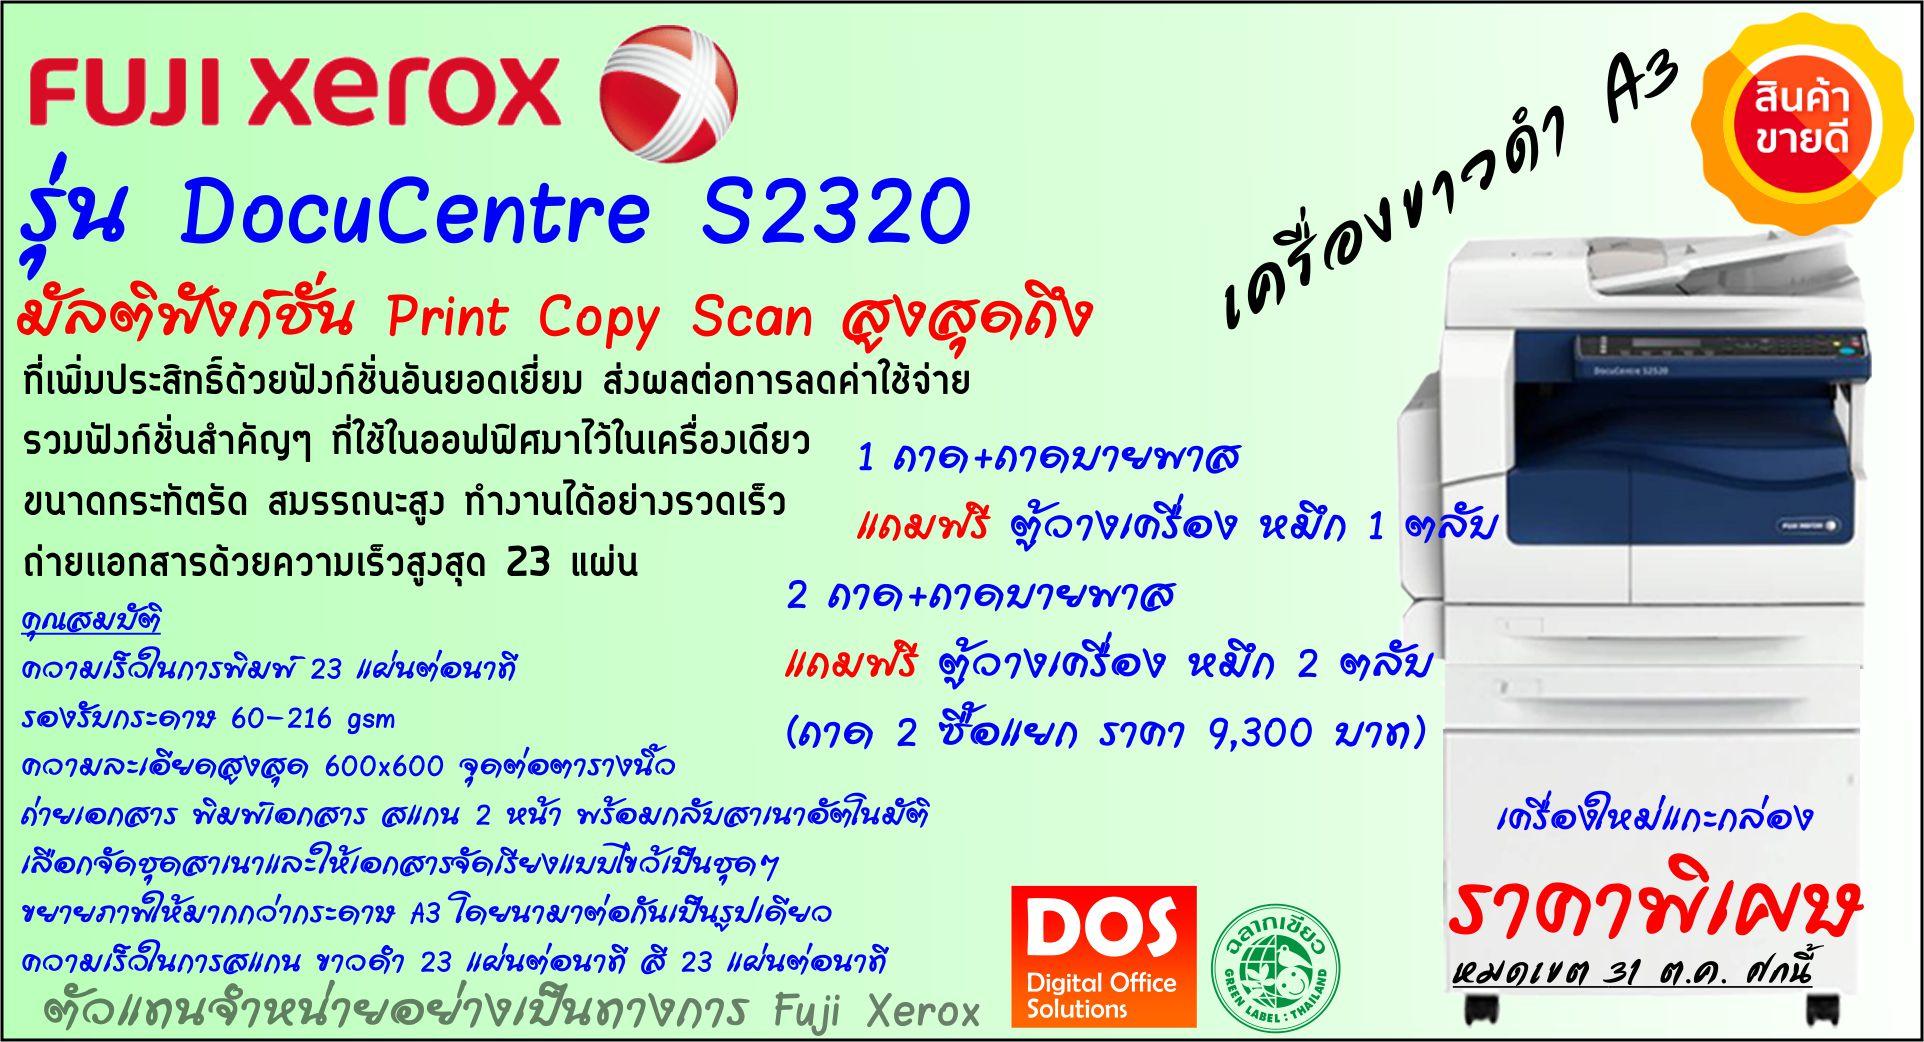 Fuji Xerox DocuCentre S2320 New Multifunction A3